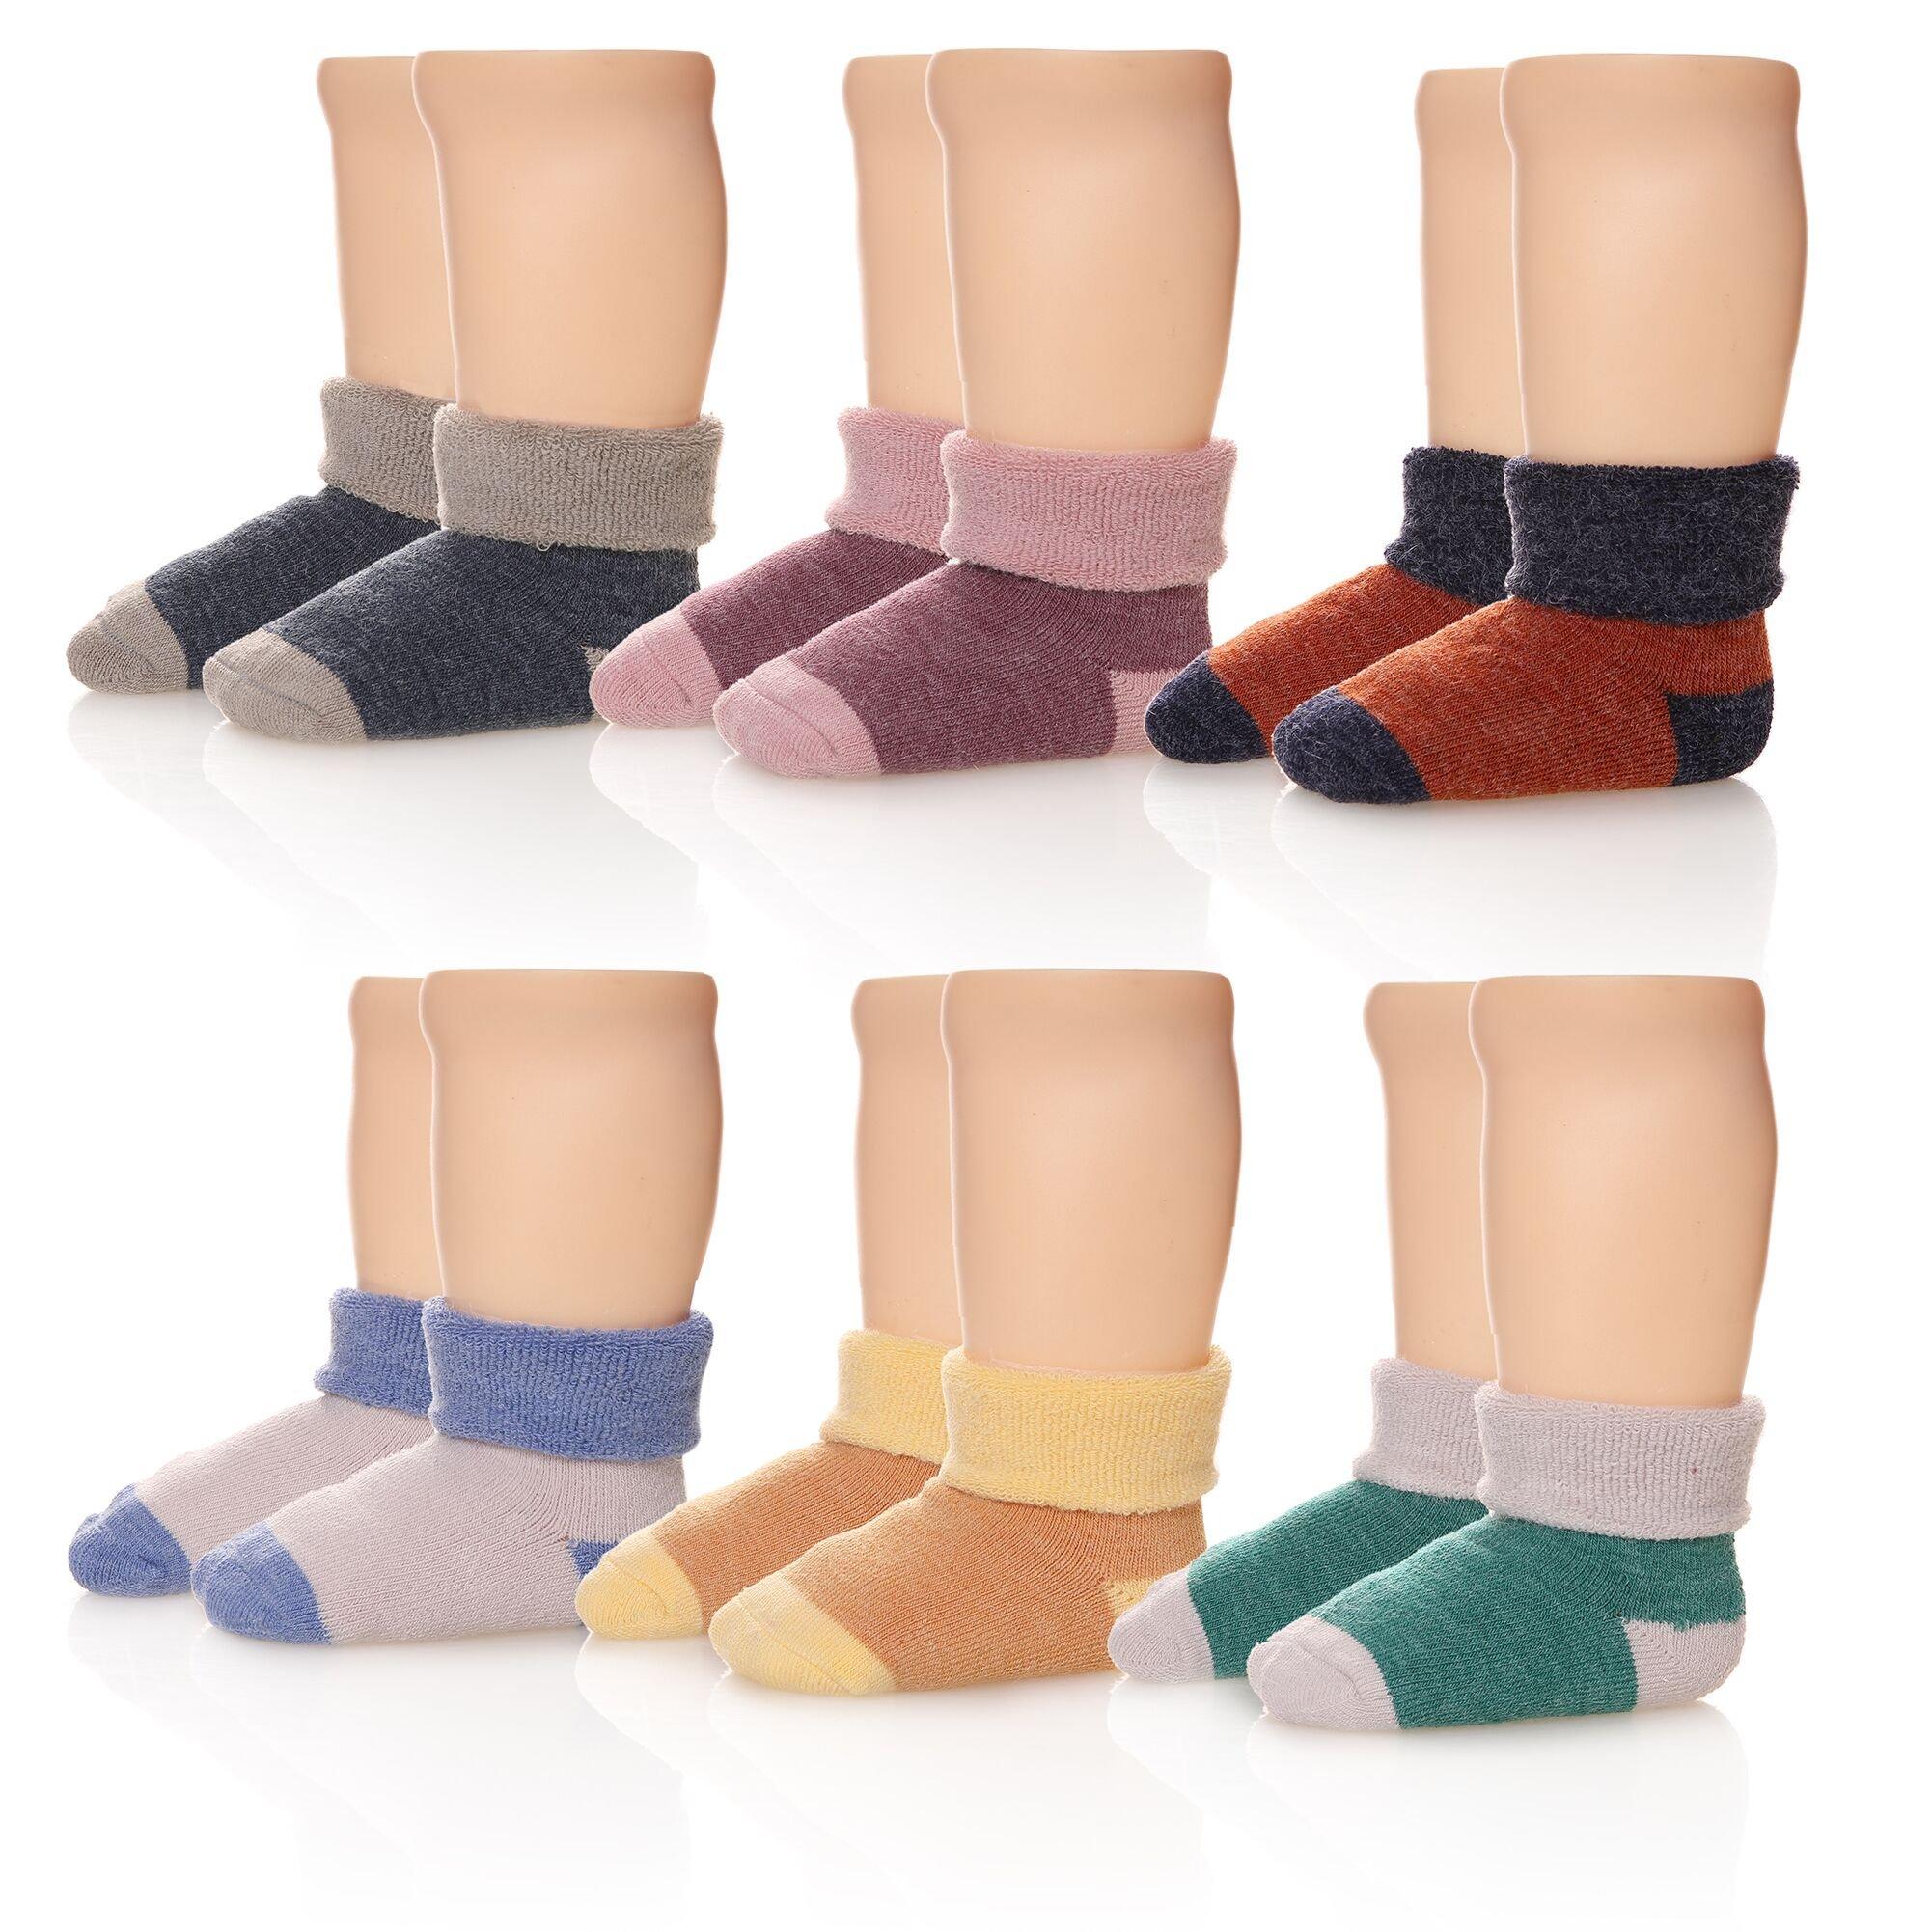 Eocom 6 Pairs Children's Winter Thick Warm Wool Socks Soft Kids Socks Random Color (0-1 Years, Solid Color)